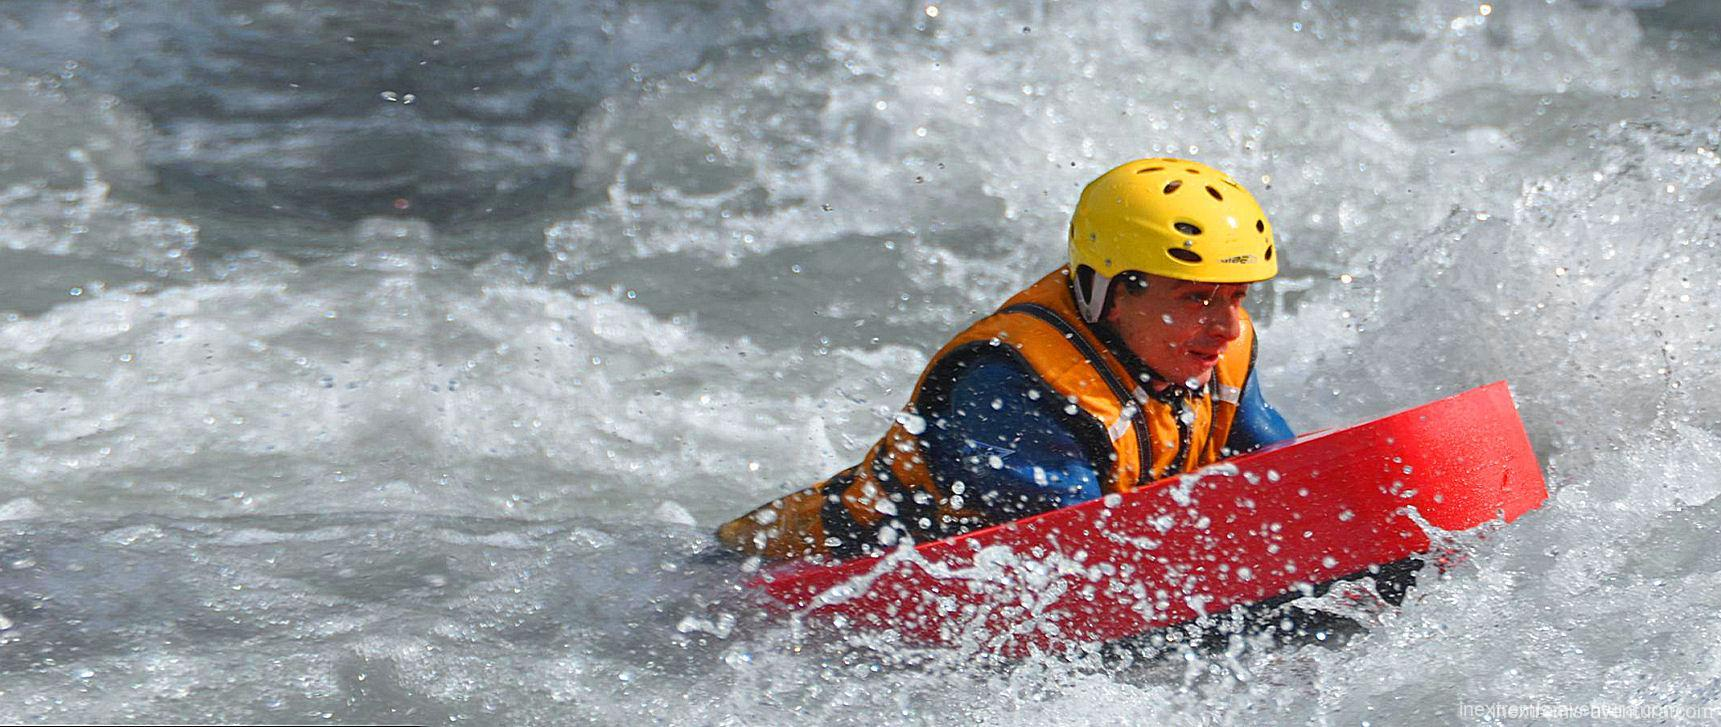 Hydrospeed Sport d'Eau Vive - Aude